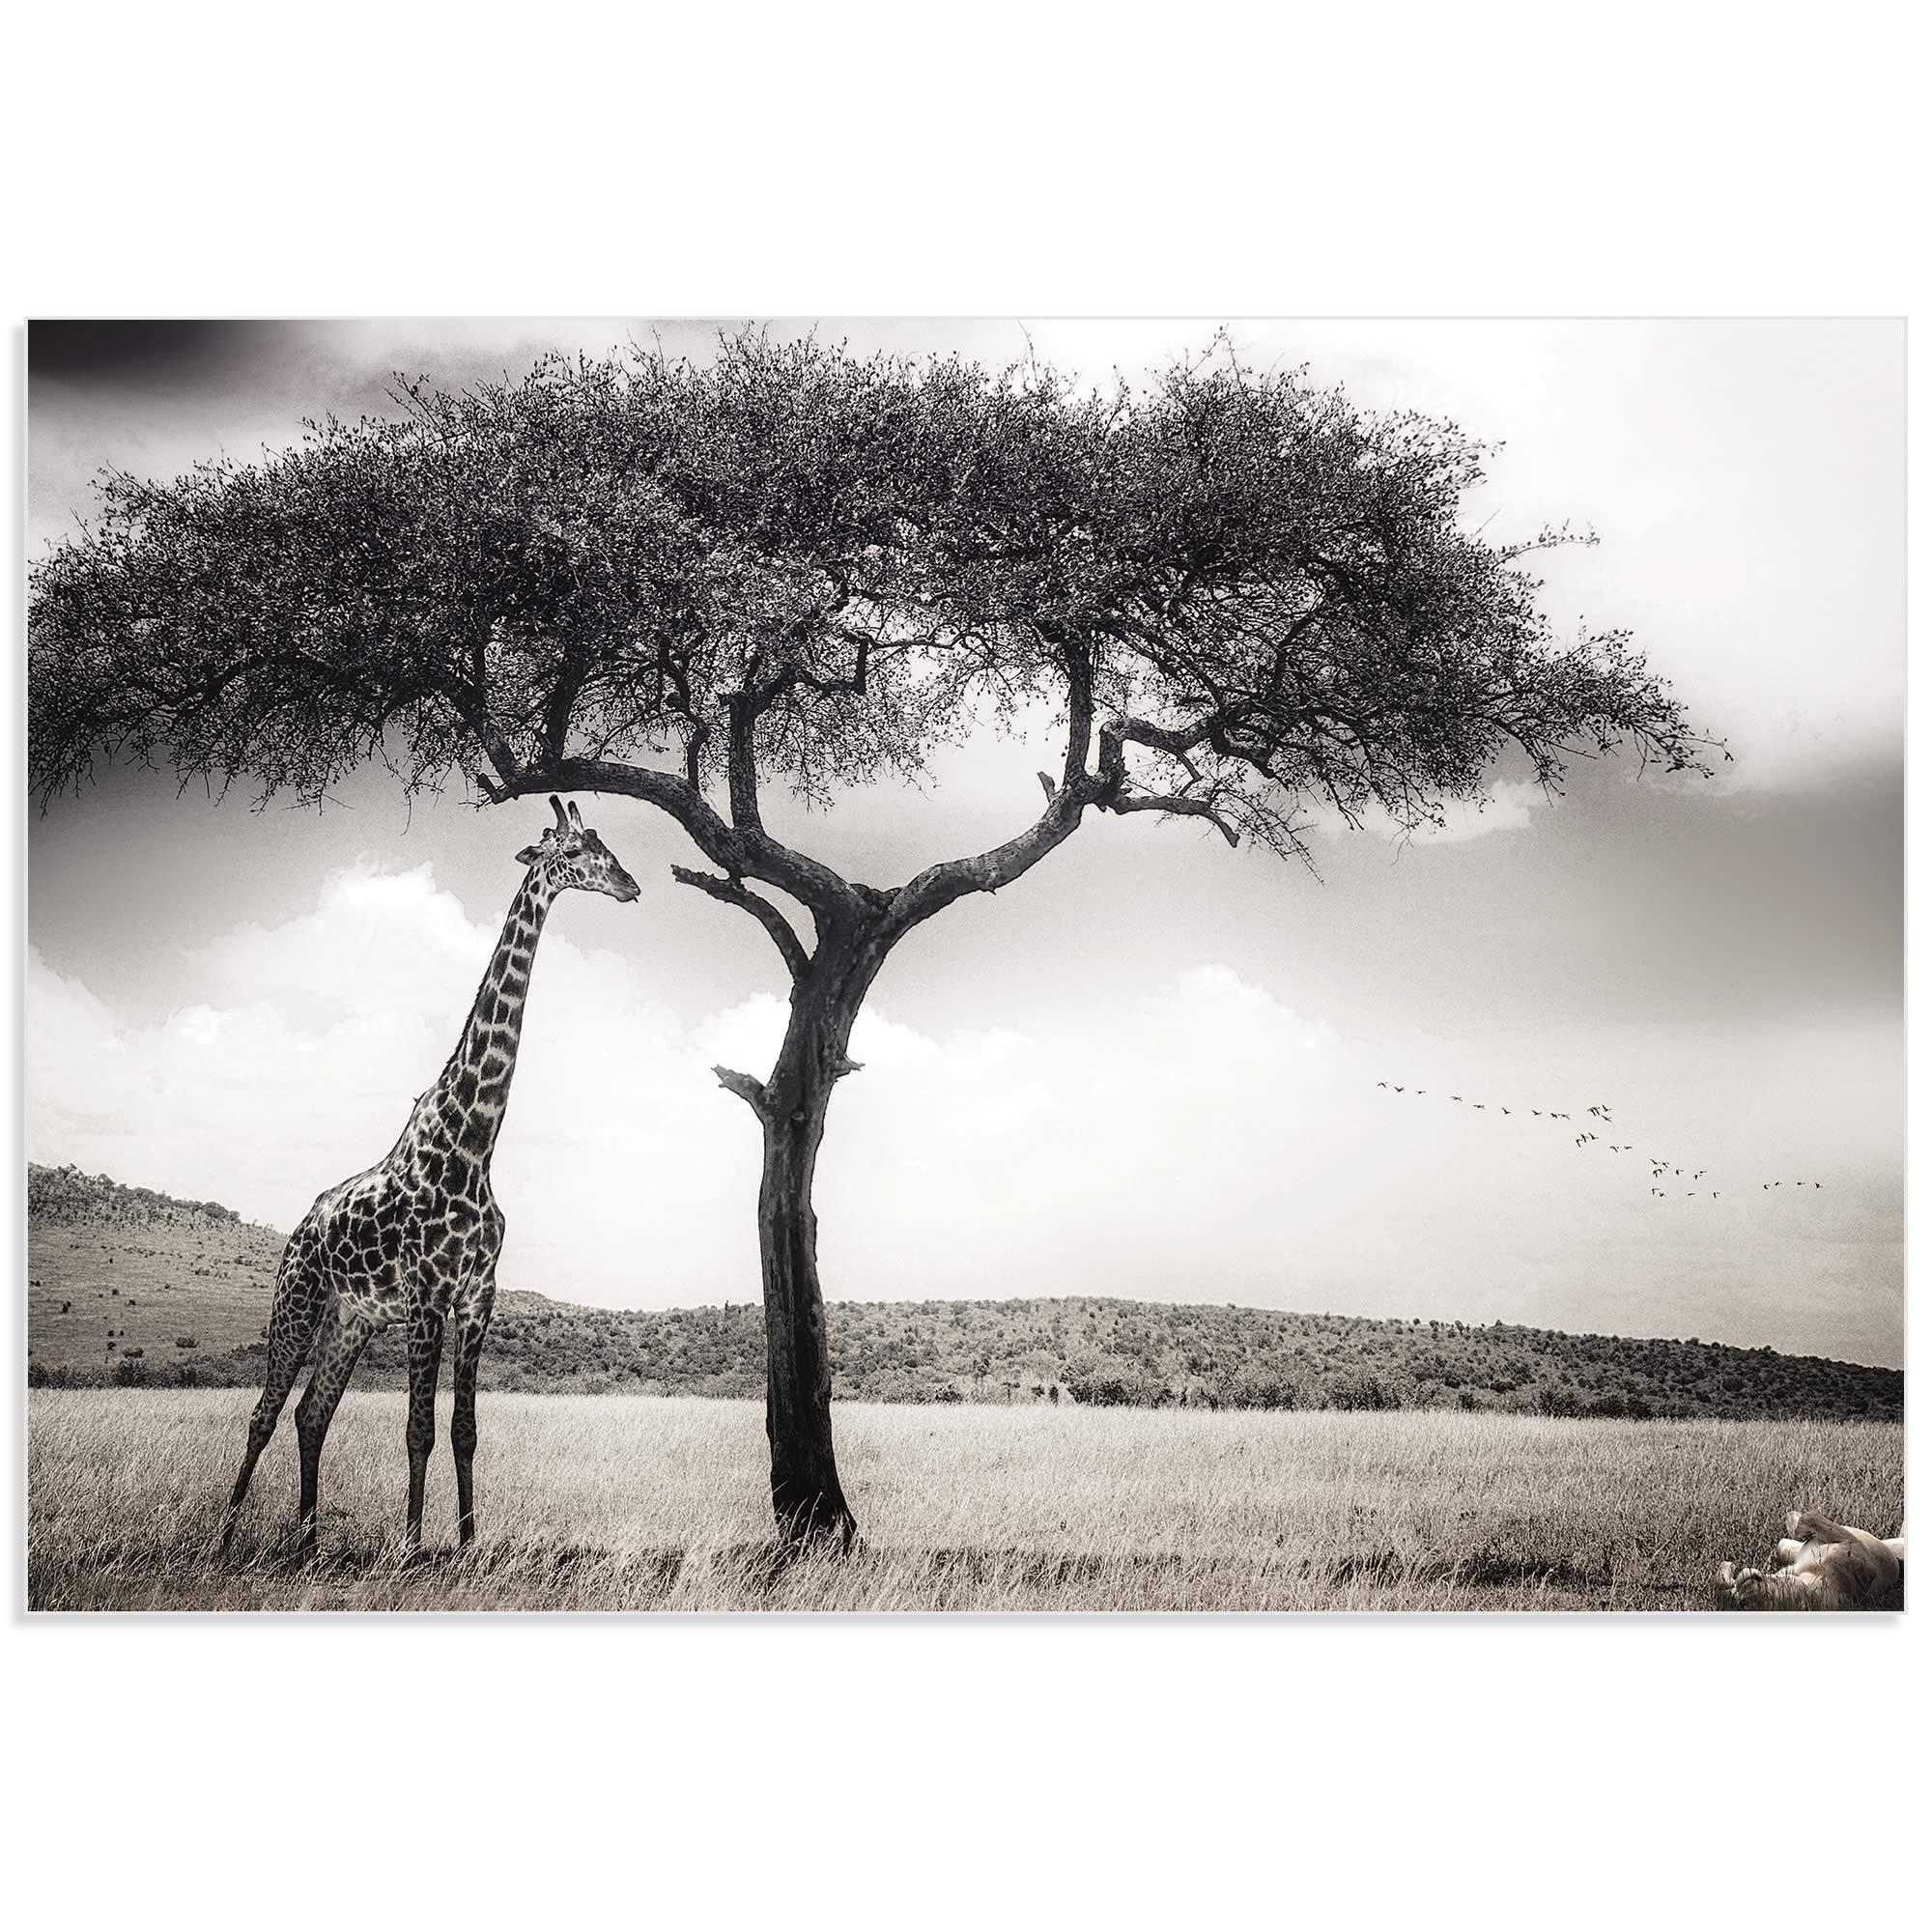 Under the African Sun by Piet Flour - Giraffe Wall Art on Metal or Acrylic - Alternate View 2